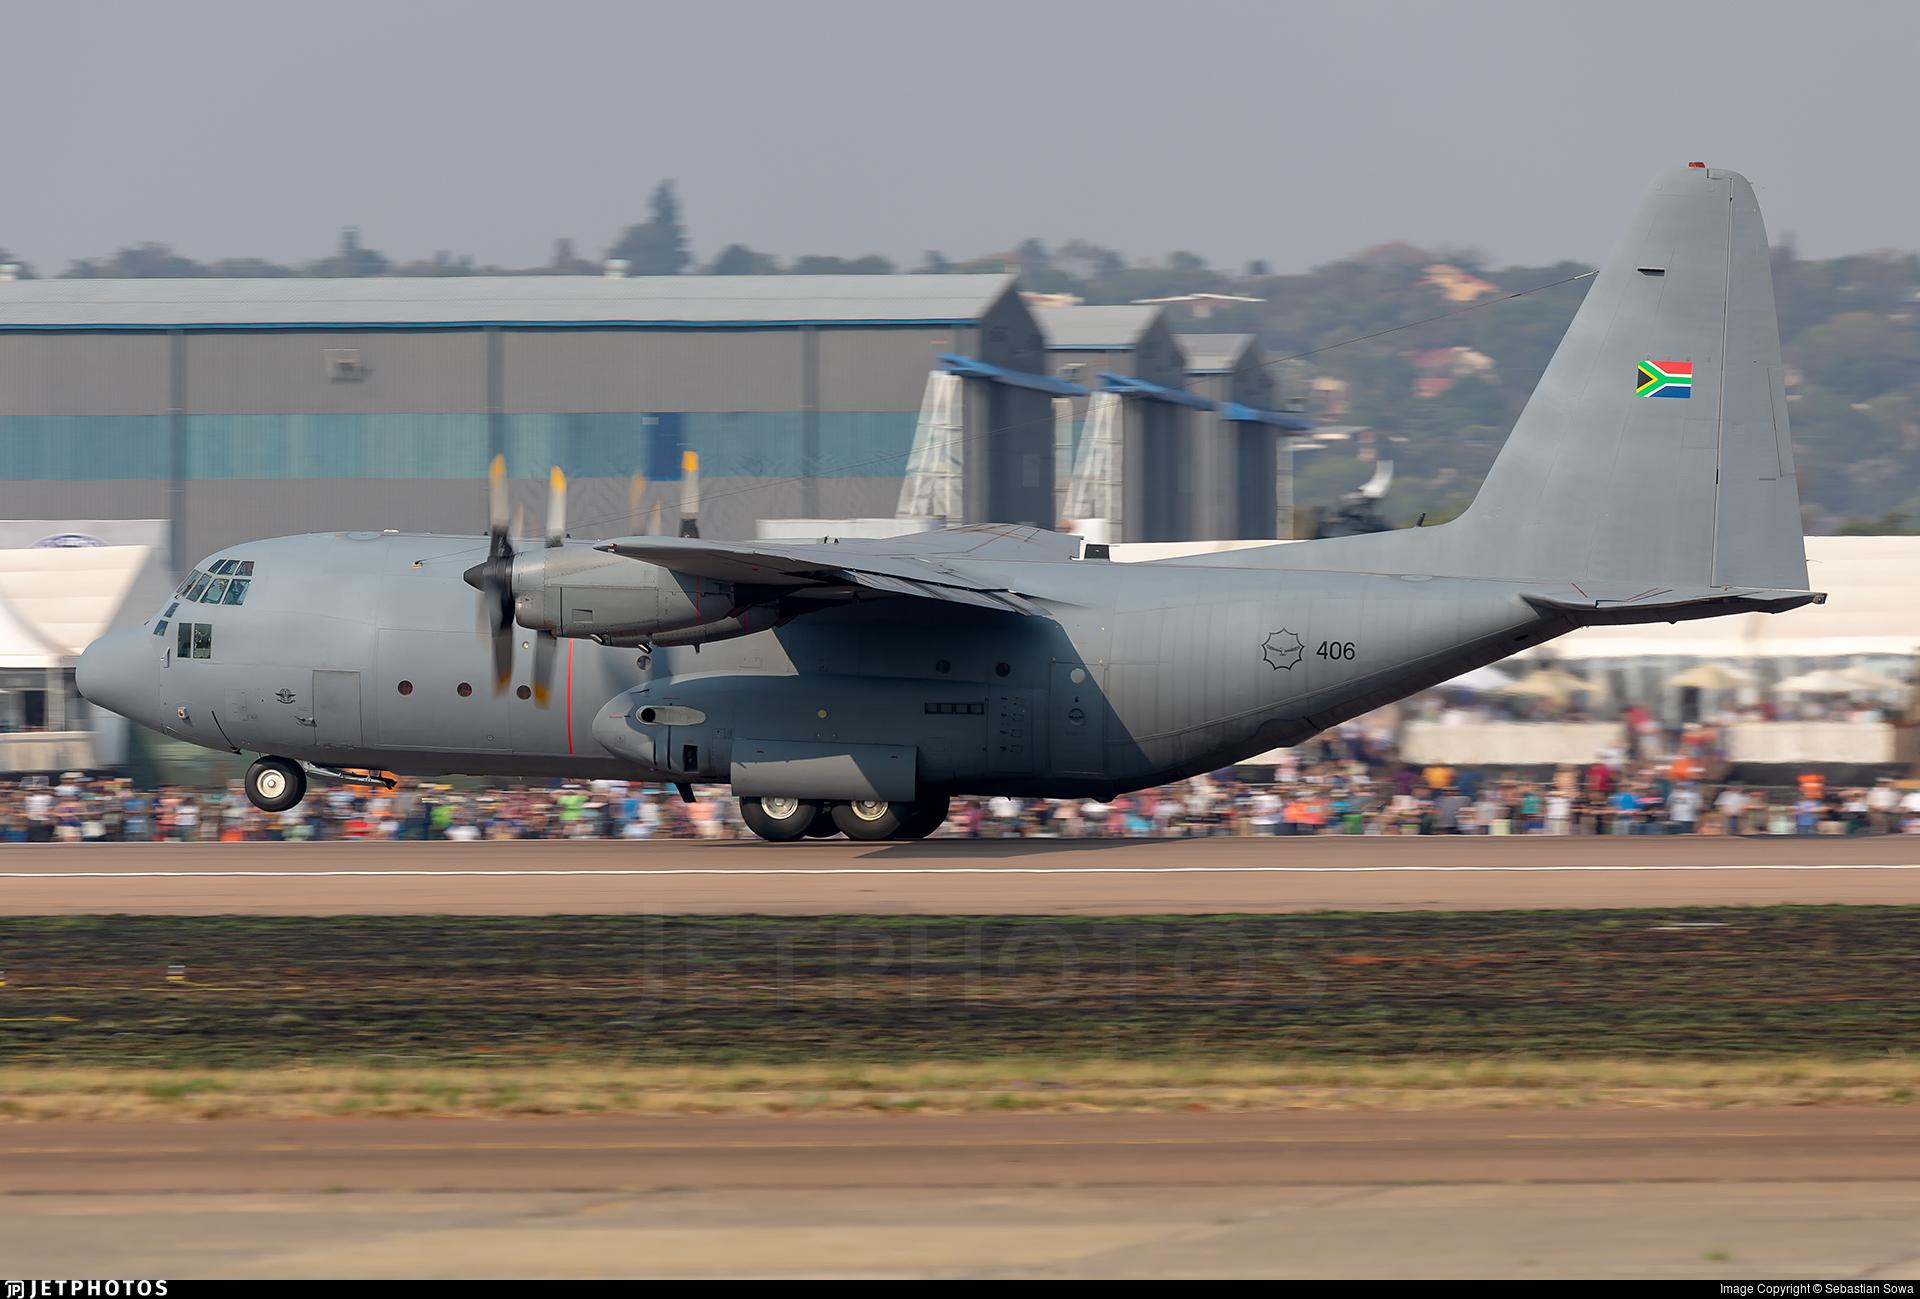 406 - Lockheed C-130B Hercules - South Africa - Air Force